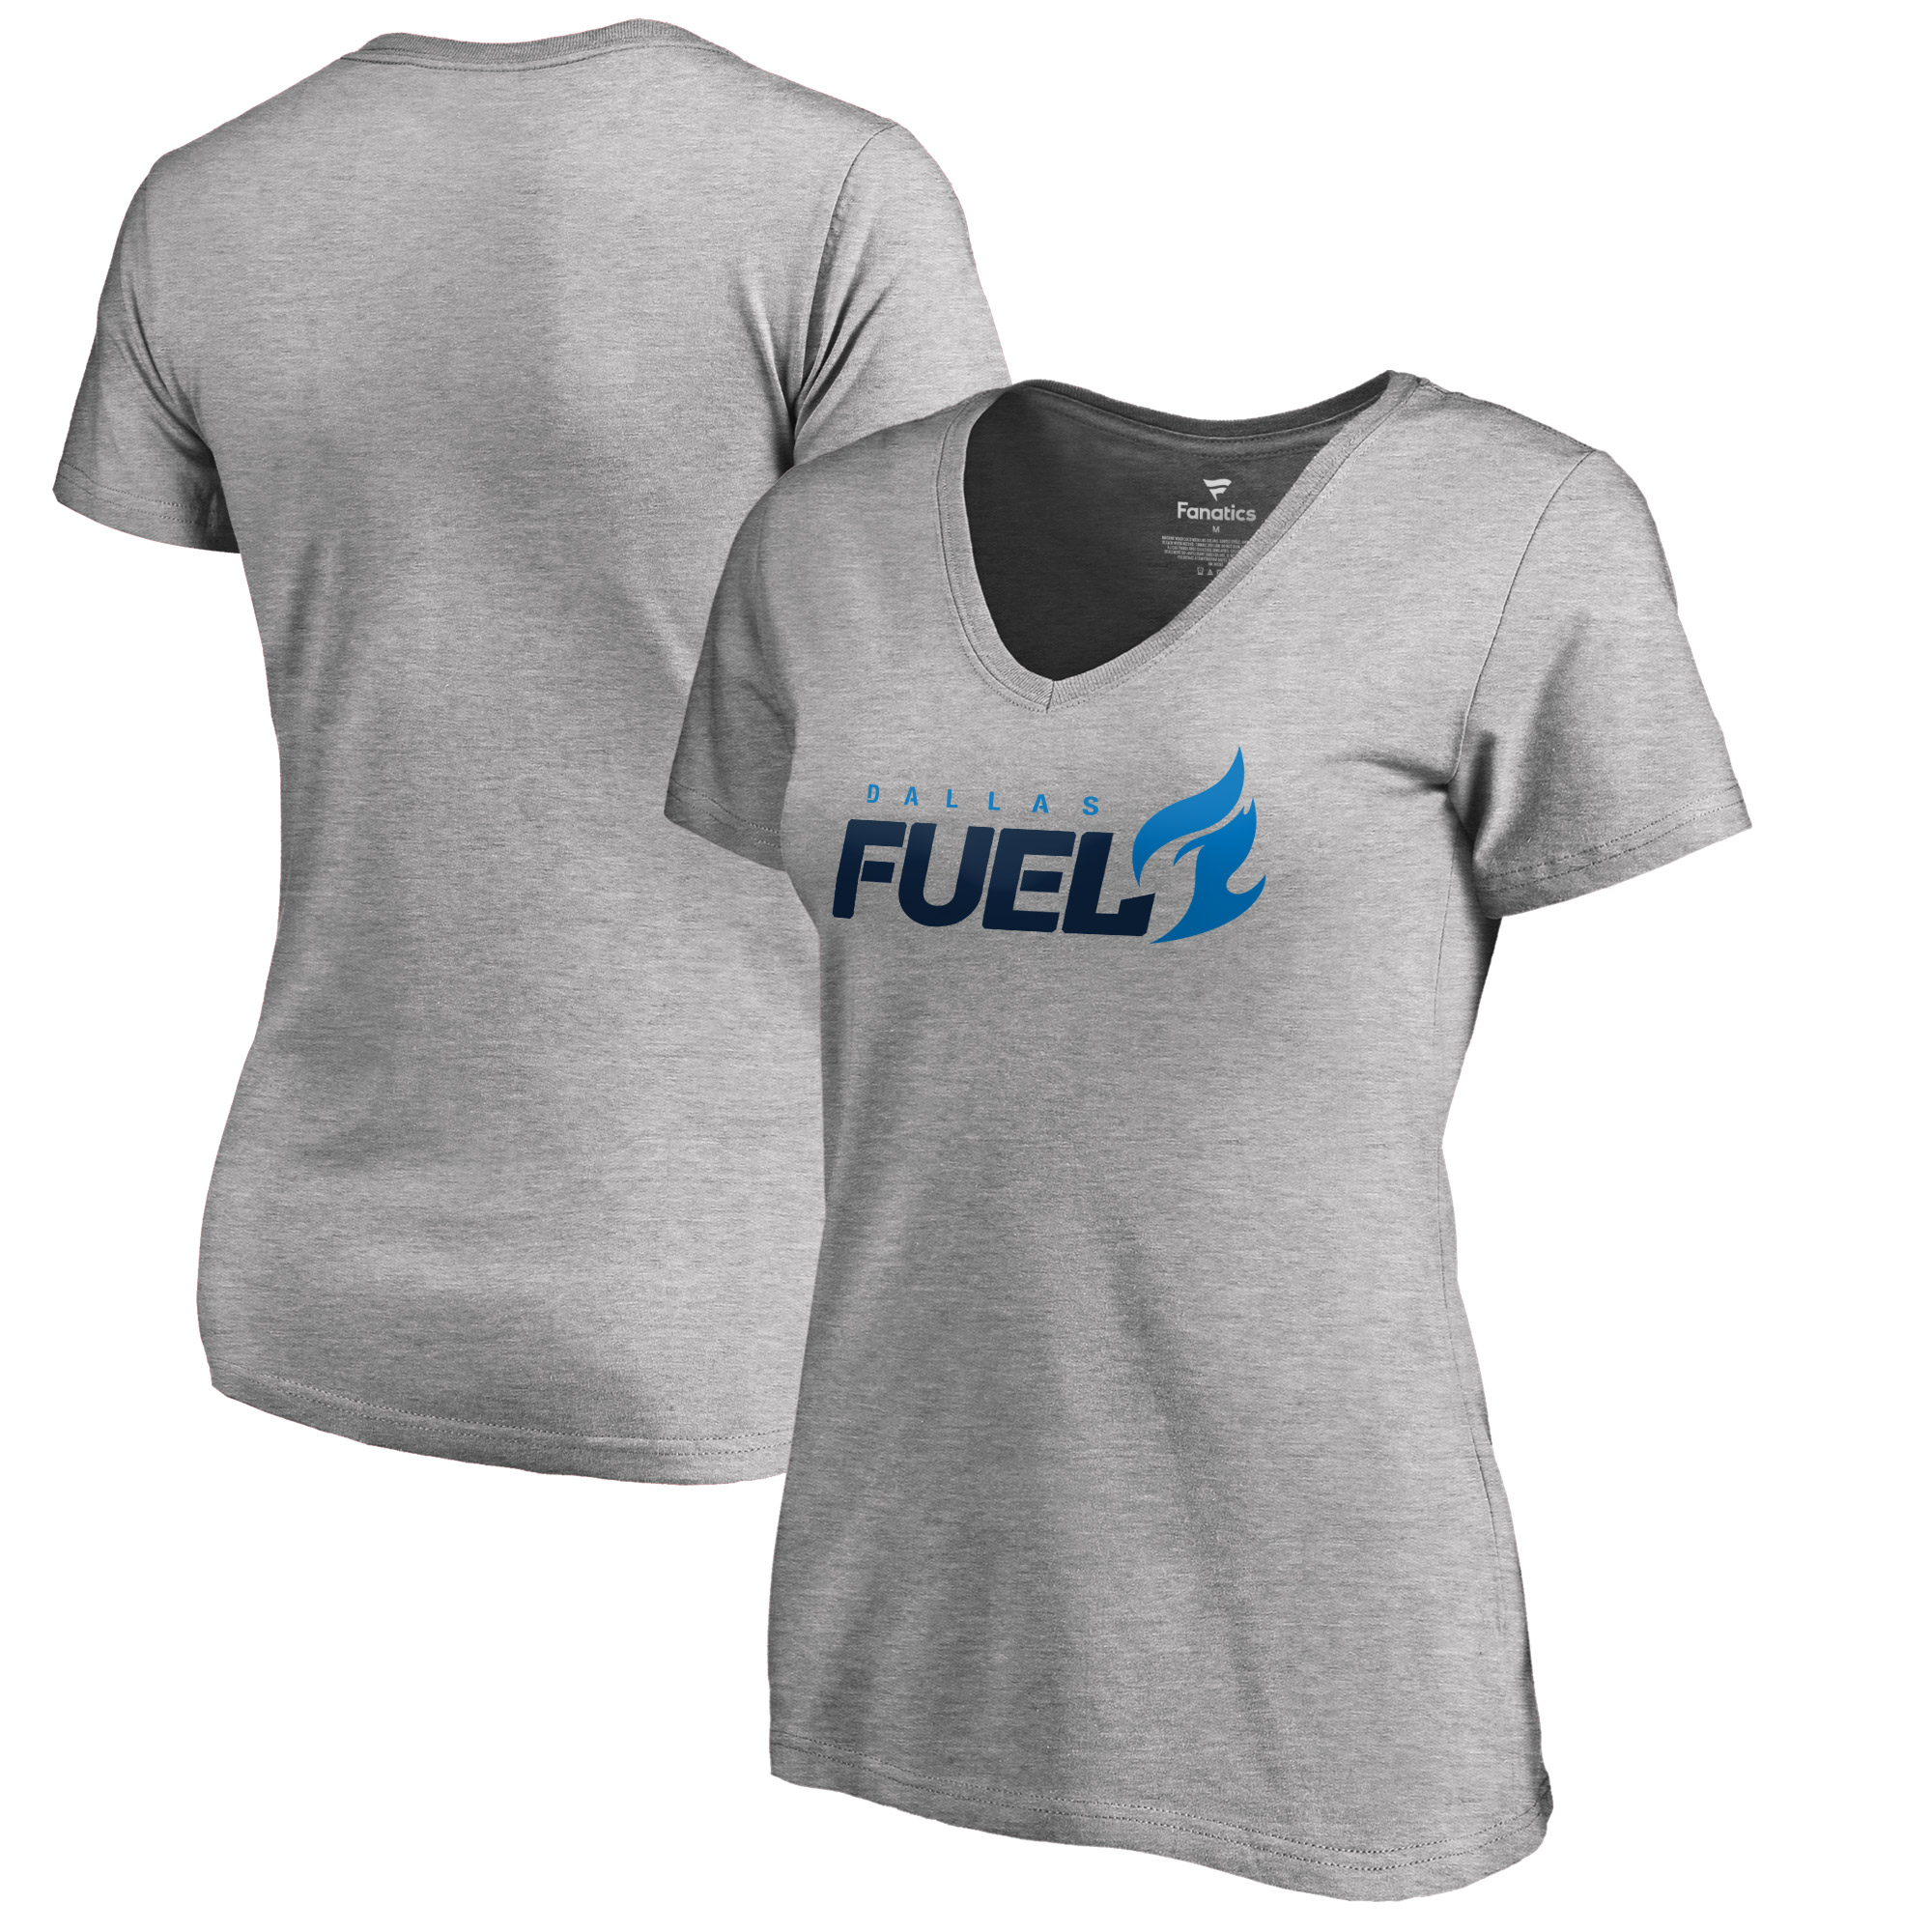 Dallas Fuel Fanatics Branded Women's Team Identity V-Neck T-Shirt - Heathered Gray